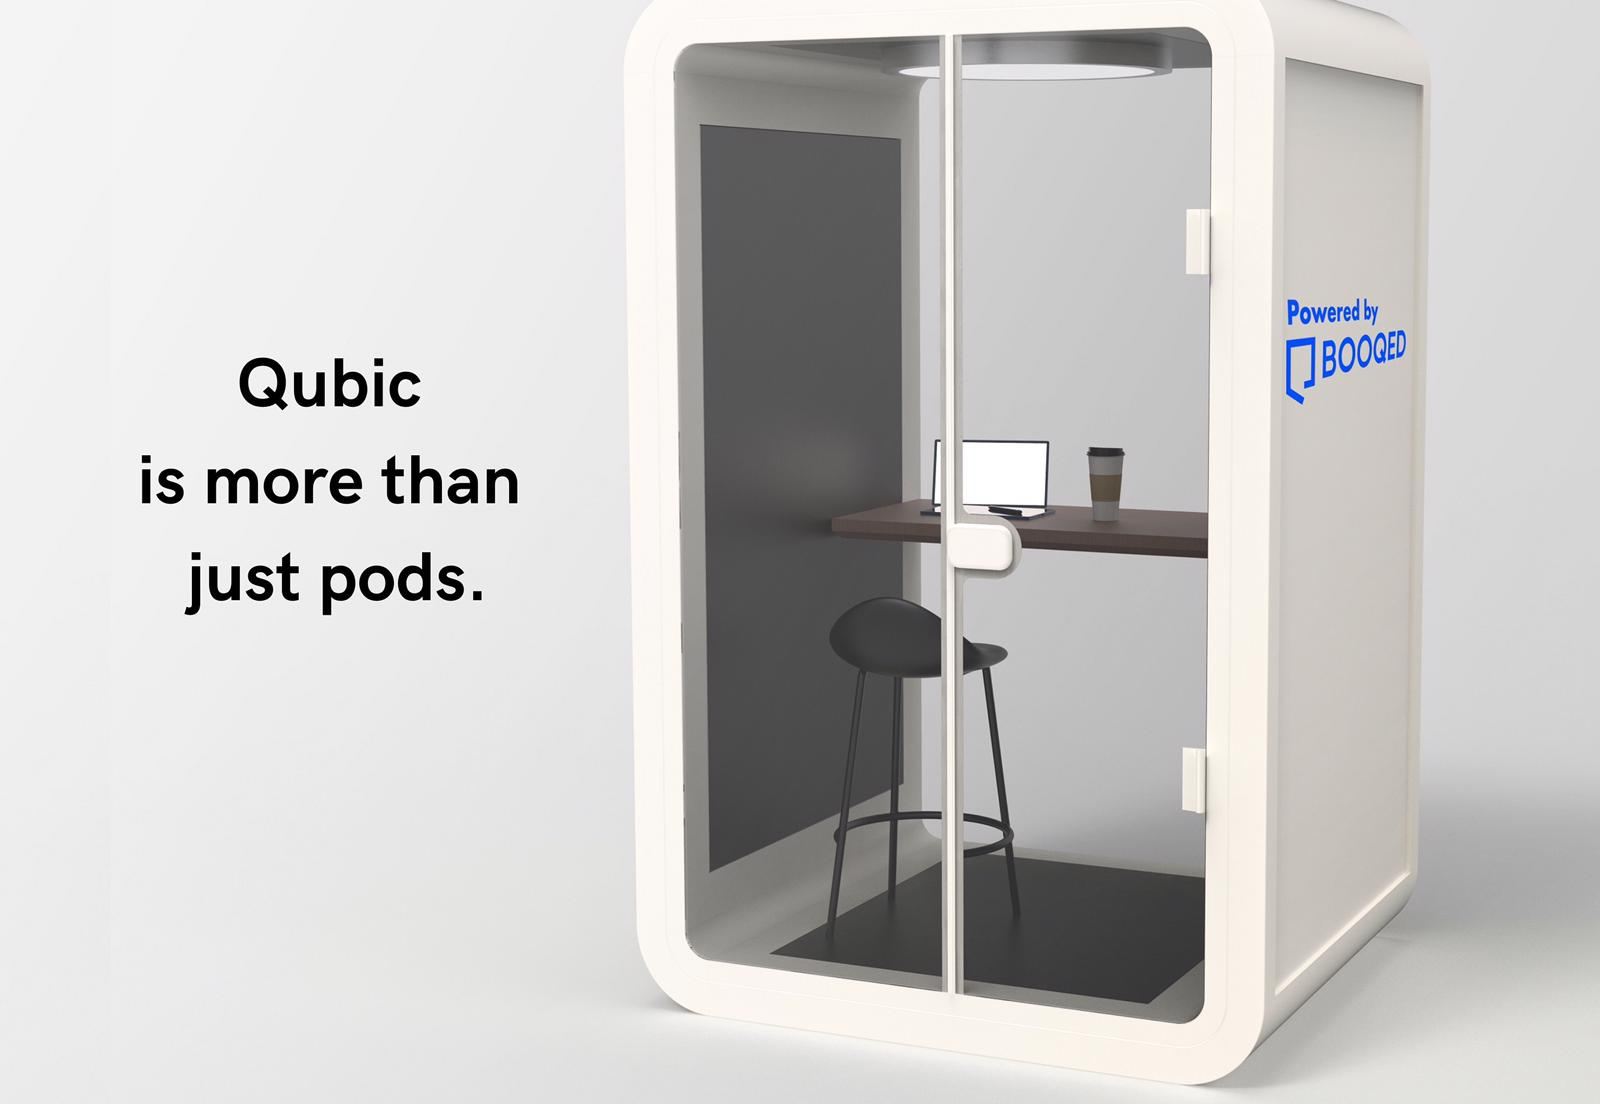 qubic work pod